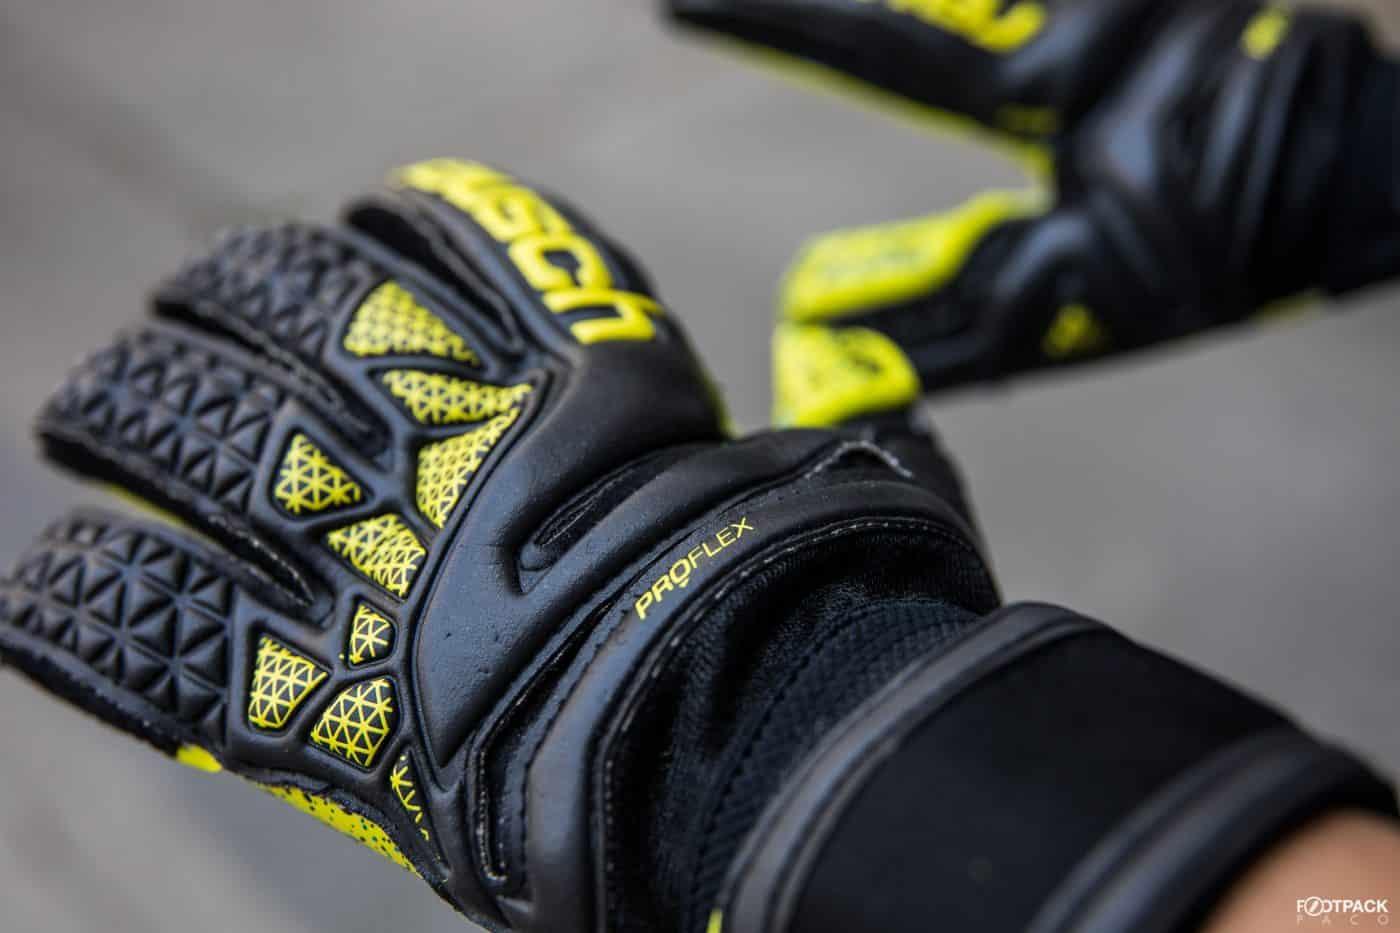 gant-reusch-fit-Control-Pro-G3-Fusion-HL-hugo-lloris-footpack-6